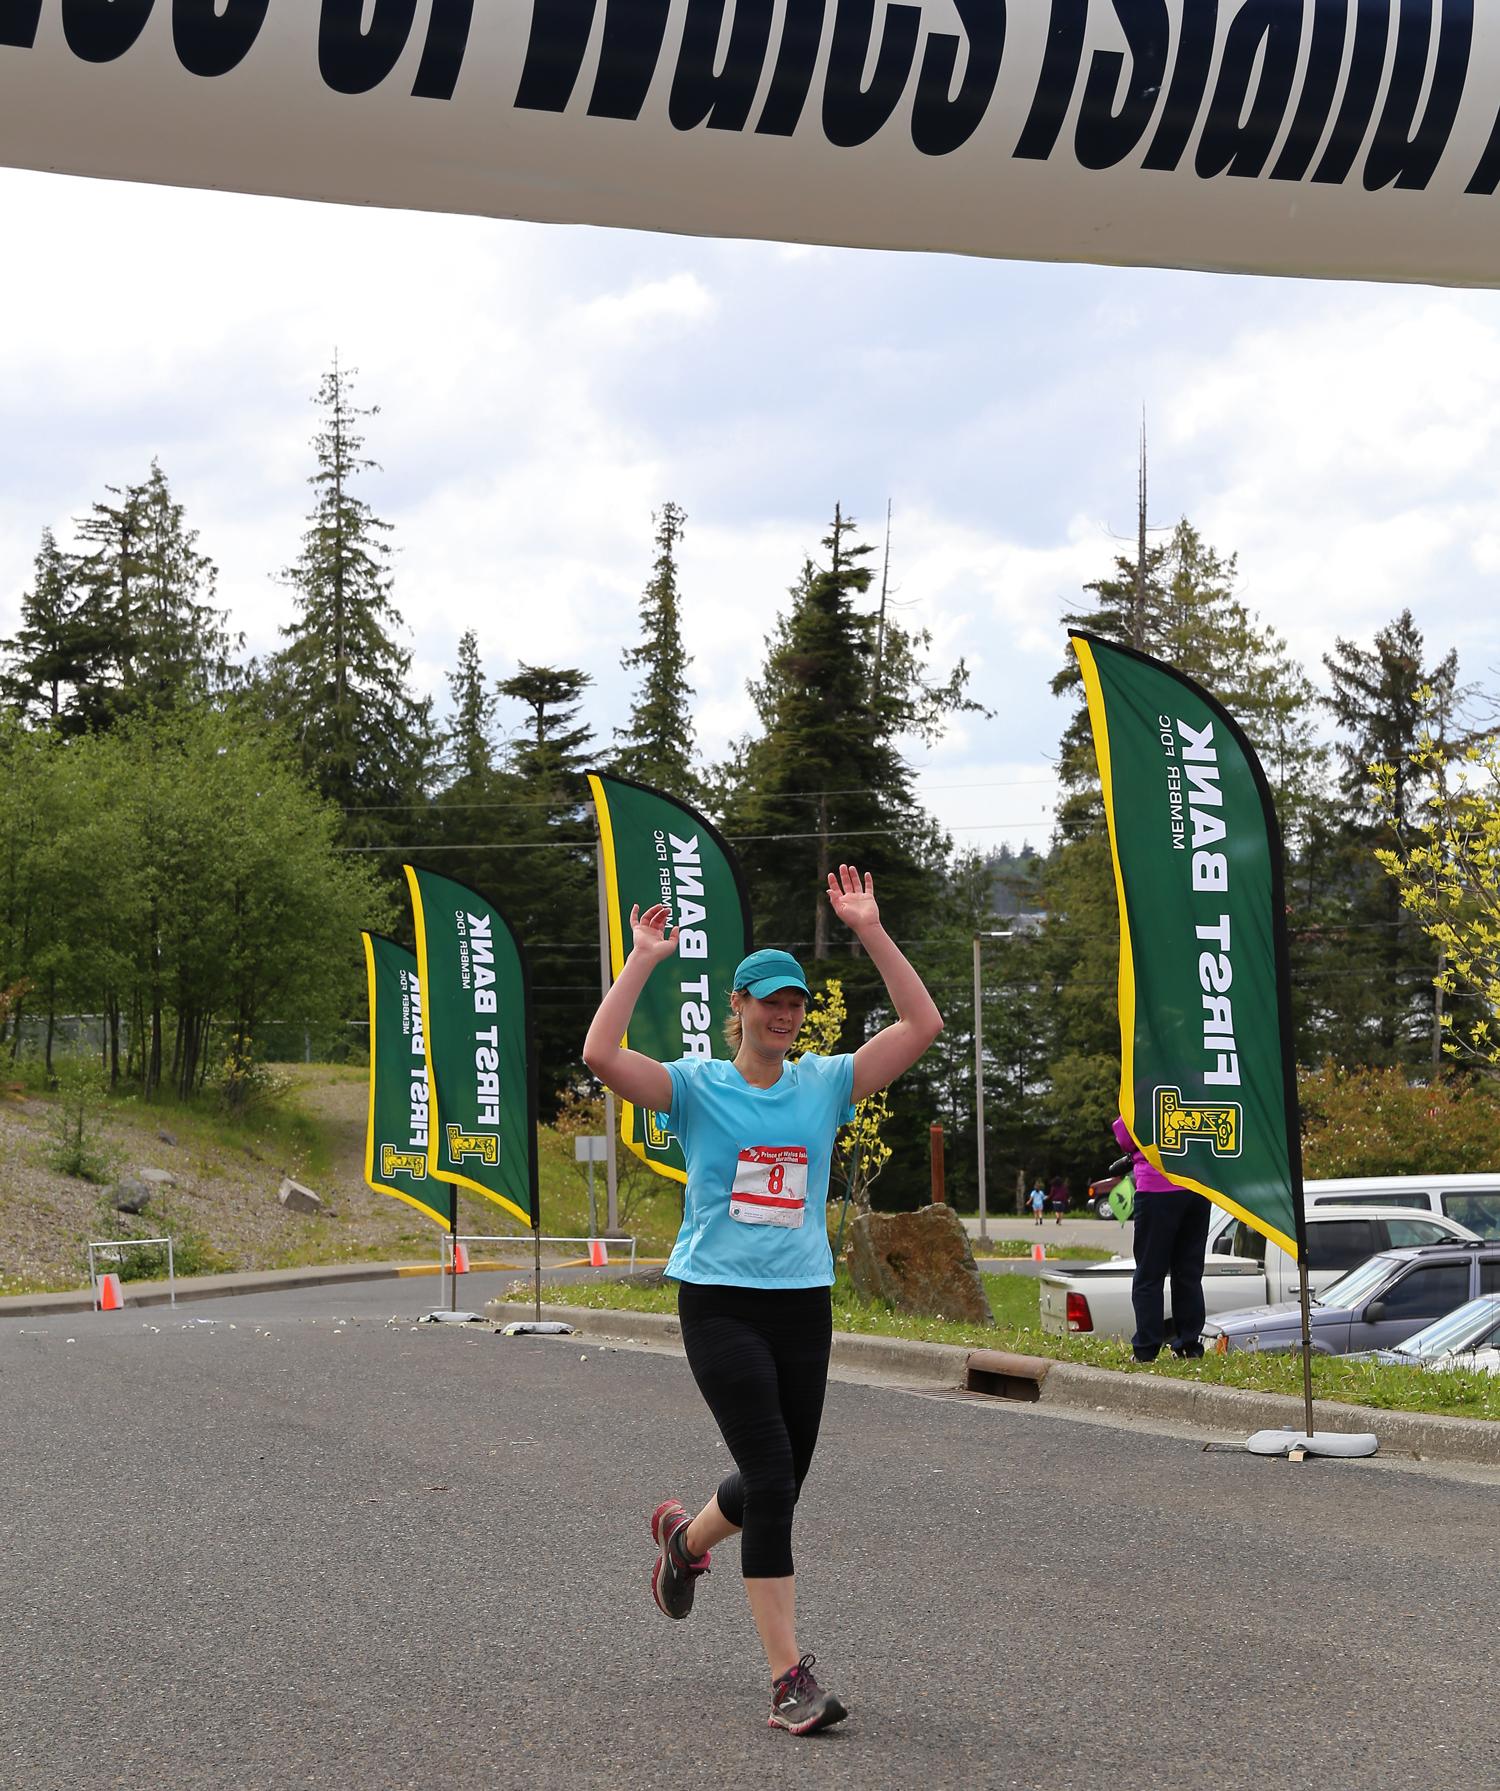 Prince of Wales Island Marathon finish line 2014